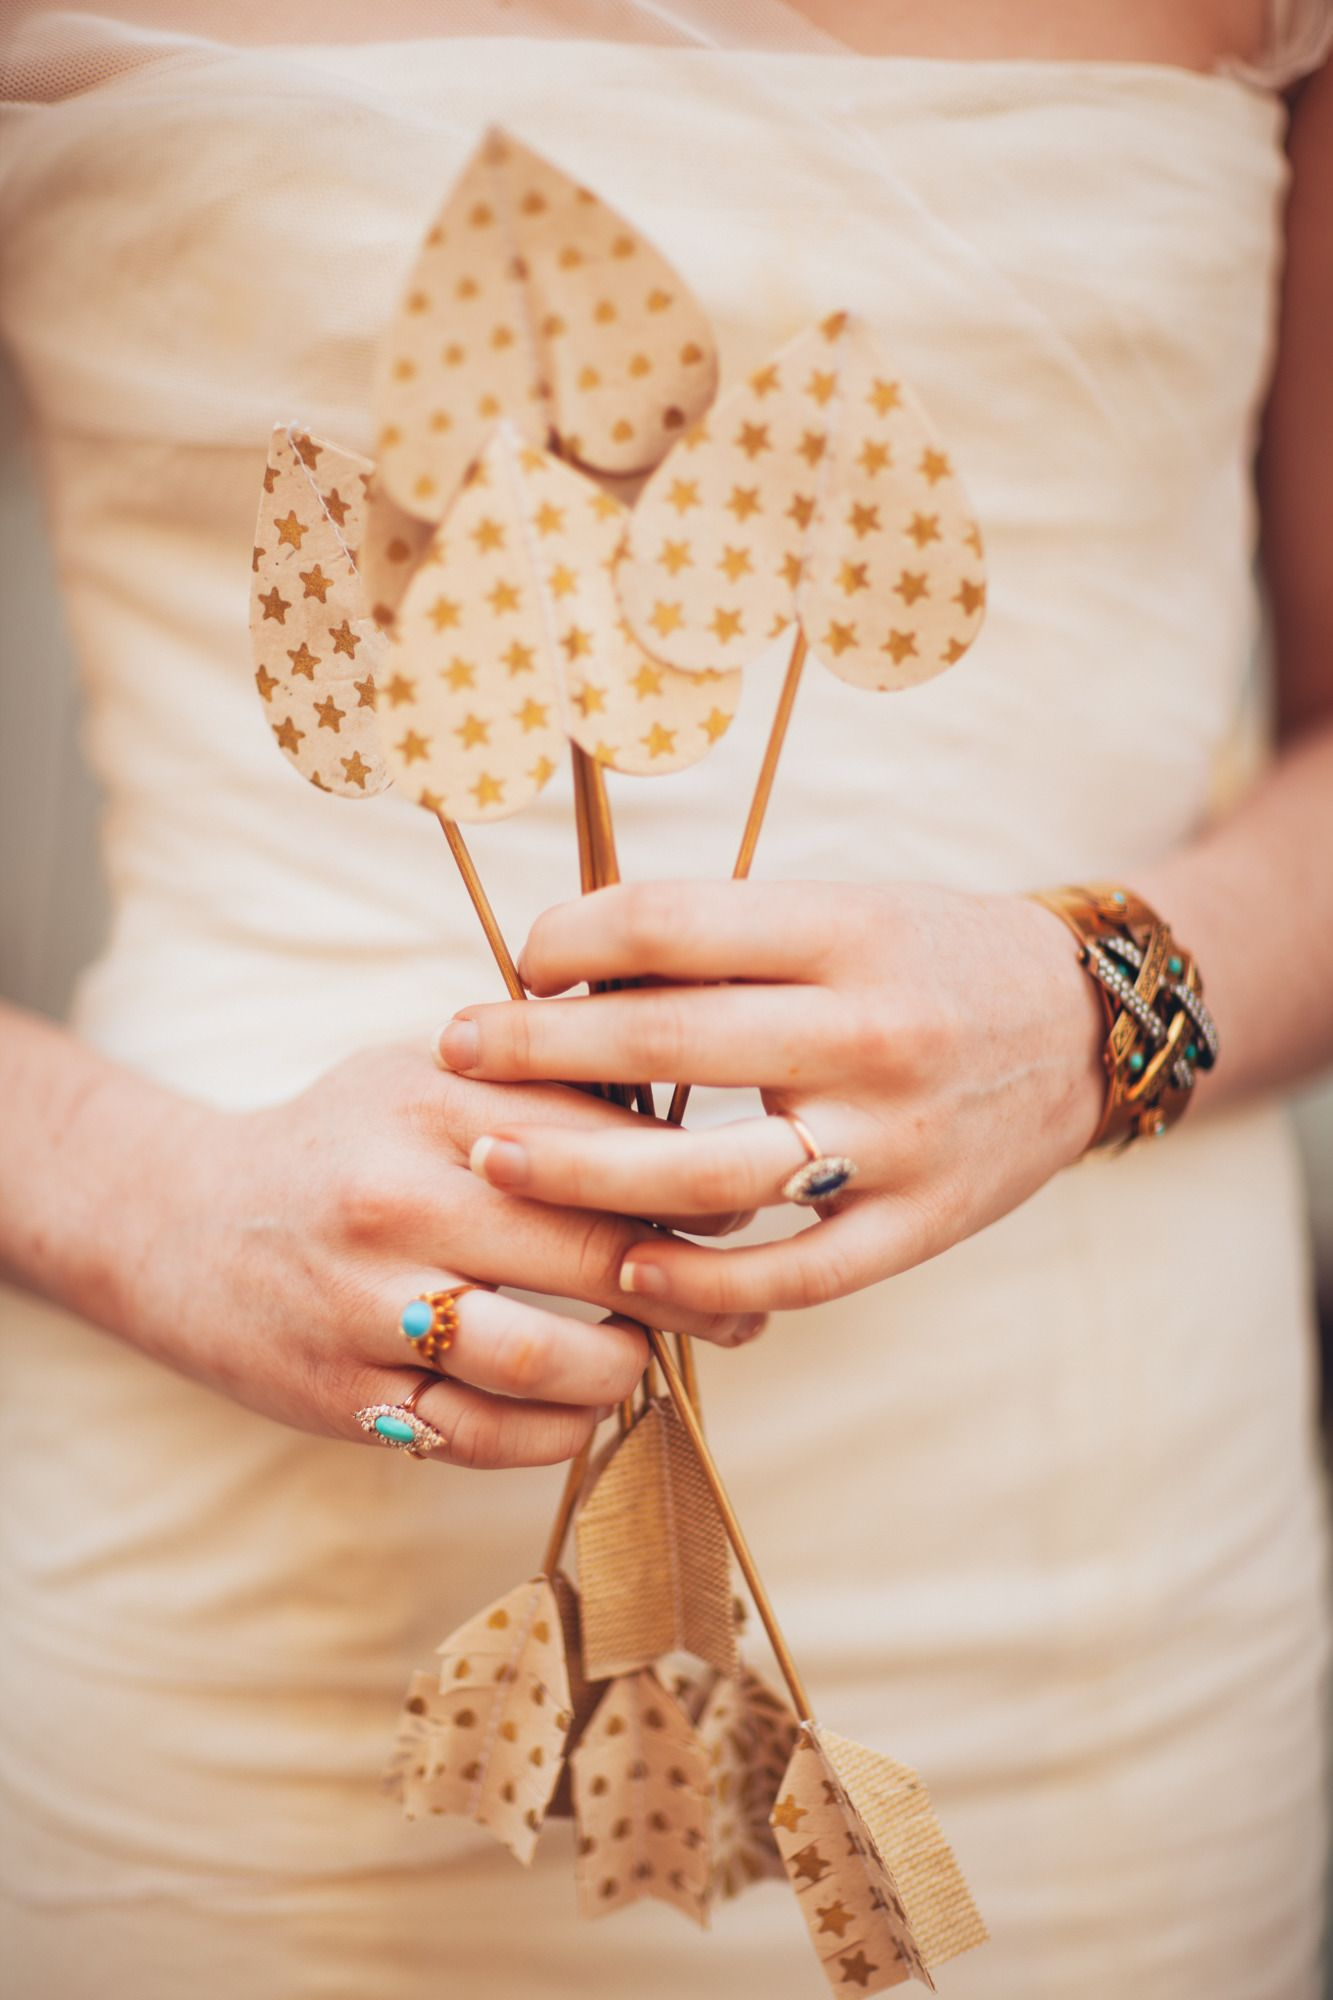 DIY gold heart arrows   Read More: http://www.stylemepretty.com/2014/08/18/diy-gold-heart-arrows-rustic-whimsical-wedding-inspiration/   Photography: Studio Finch - www.studiofinch.com